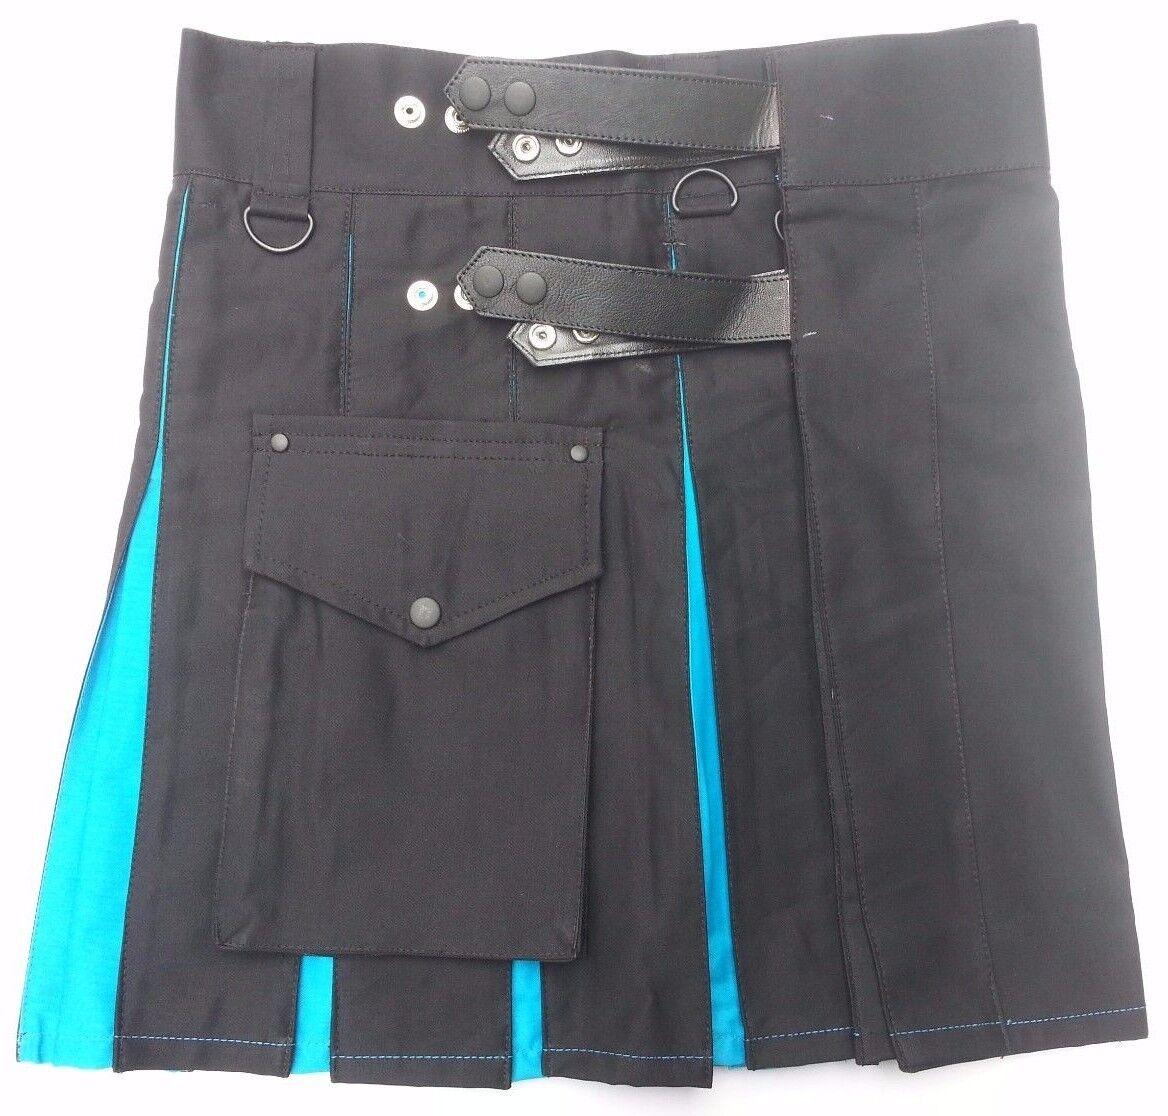 Ladies Hybrid Leather Straps Black Modern Cotton Utility Kilt - Adjustable Sizes